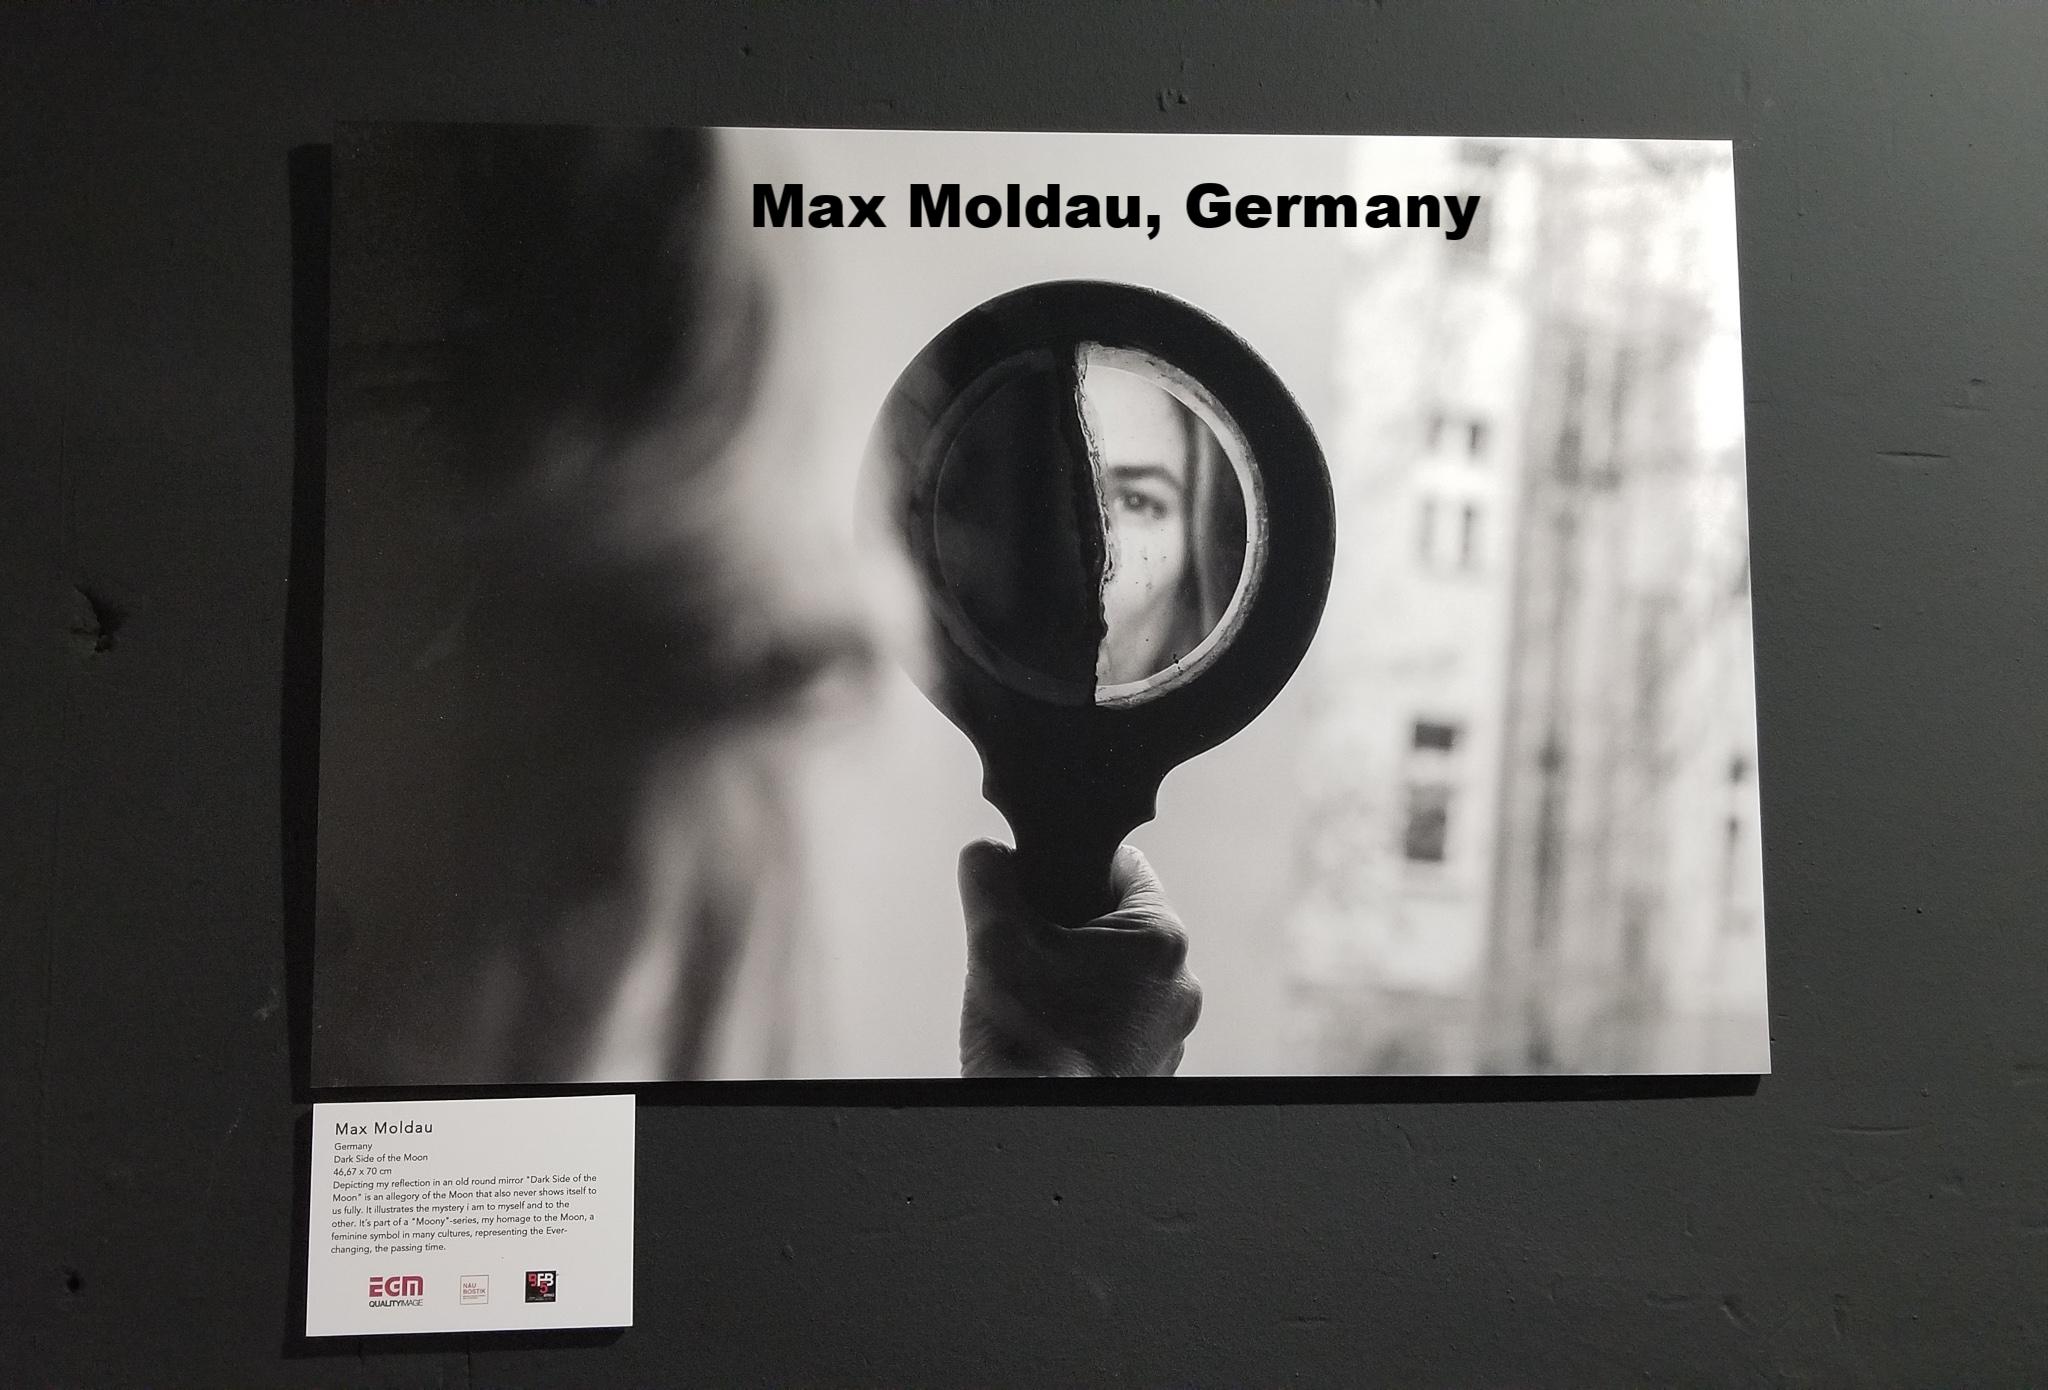 Max Moldau, Germany